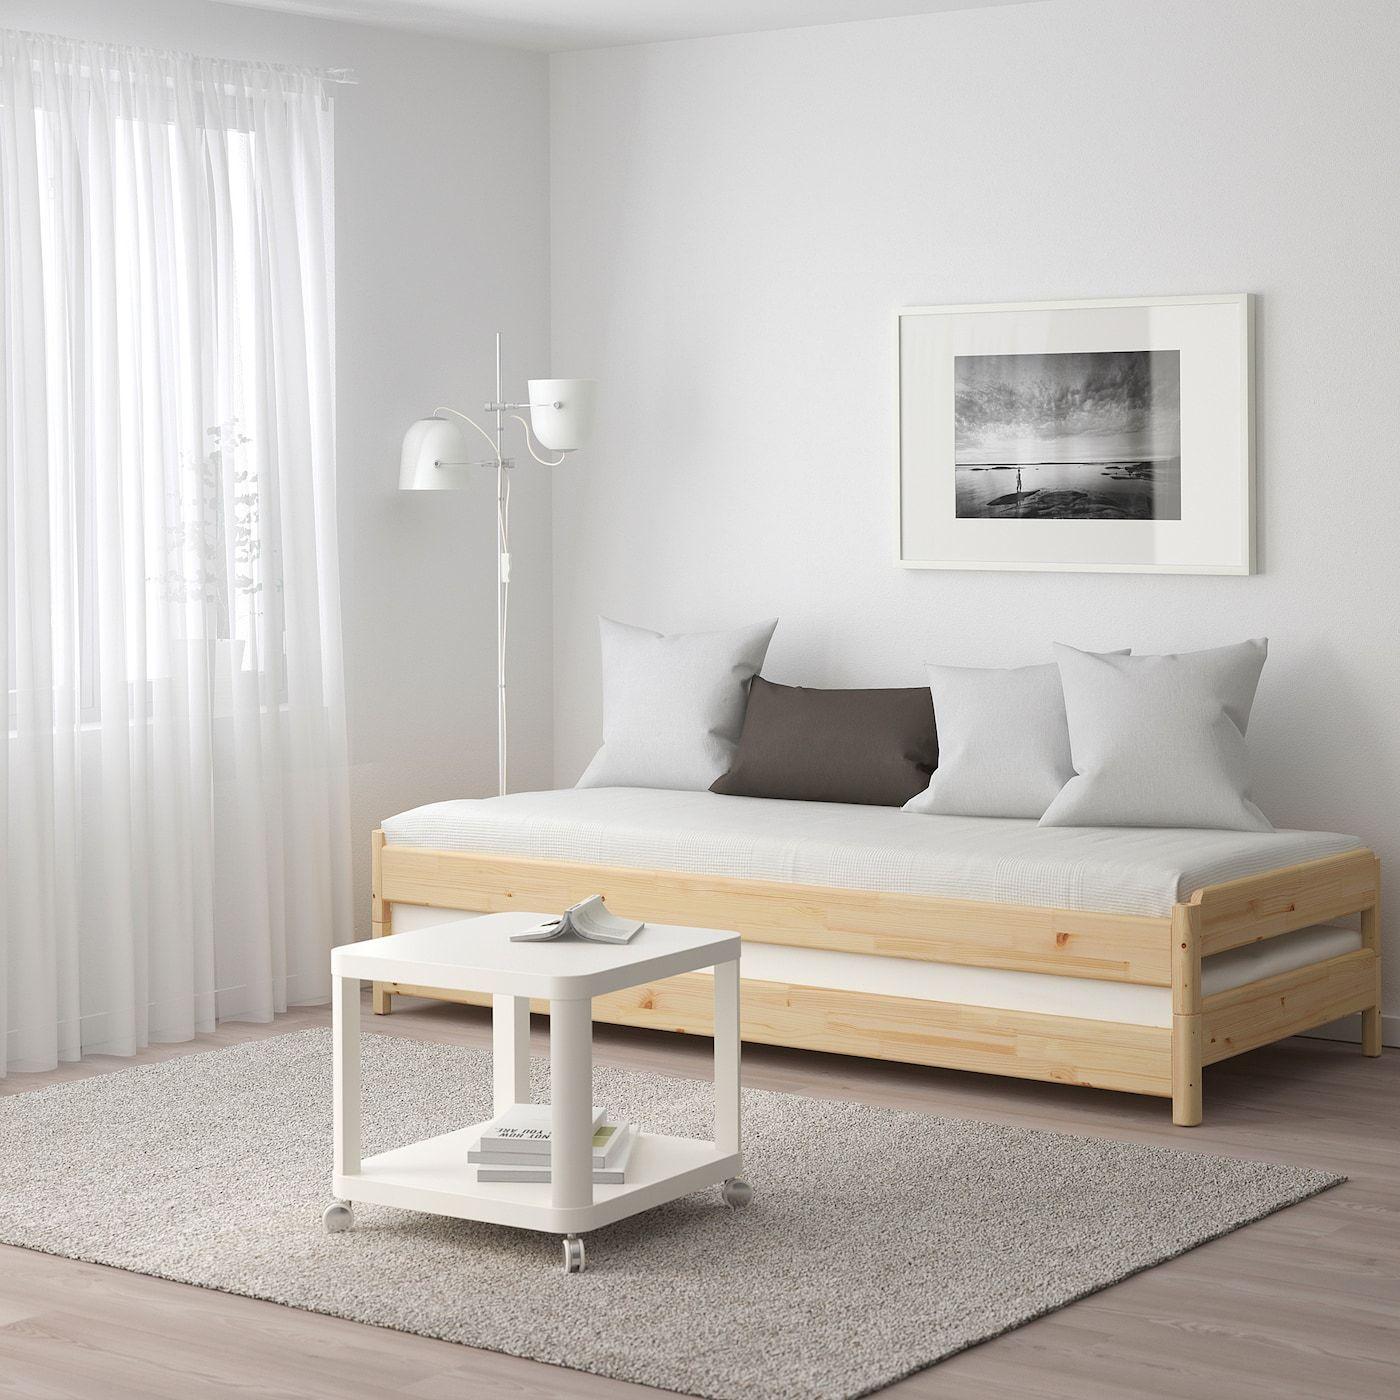 Utaker Bett Stapelbar Kiefer Ikea Osterreich In 2020 Murphy Bett Ikea Bett Ideen Diy Klappbett